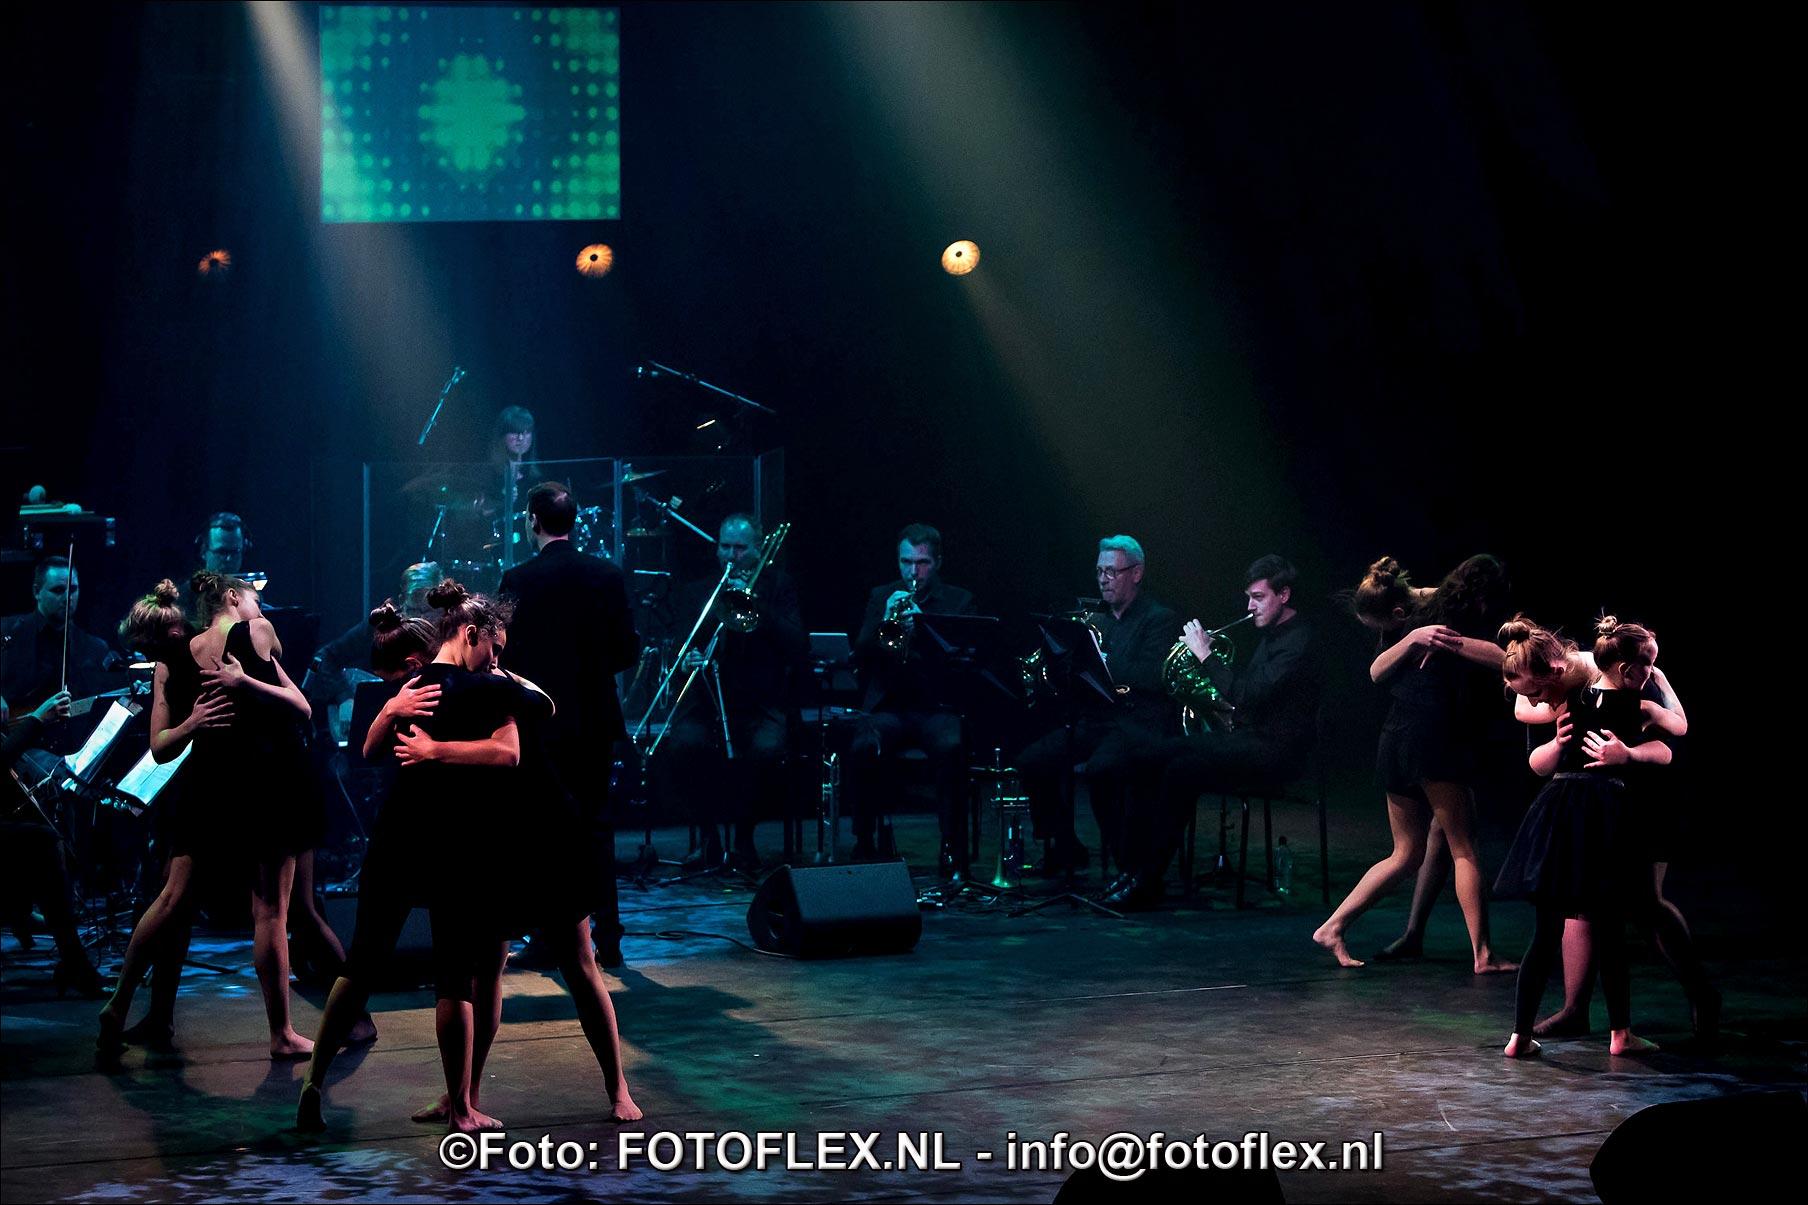 0573-CopyrightFOTOFLEX.NL07012020